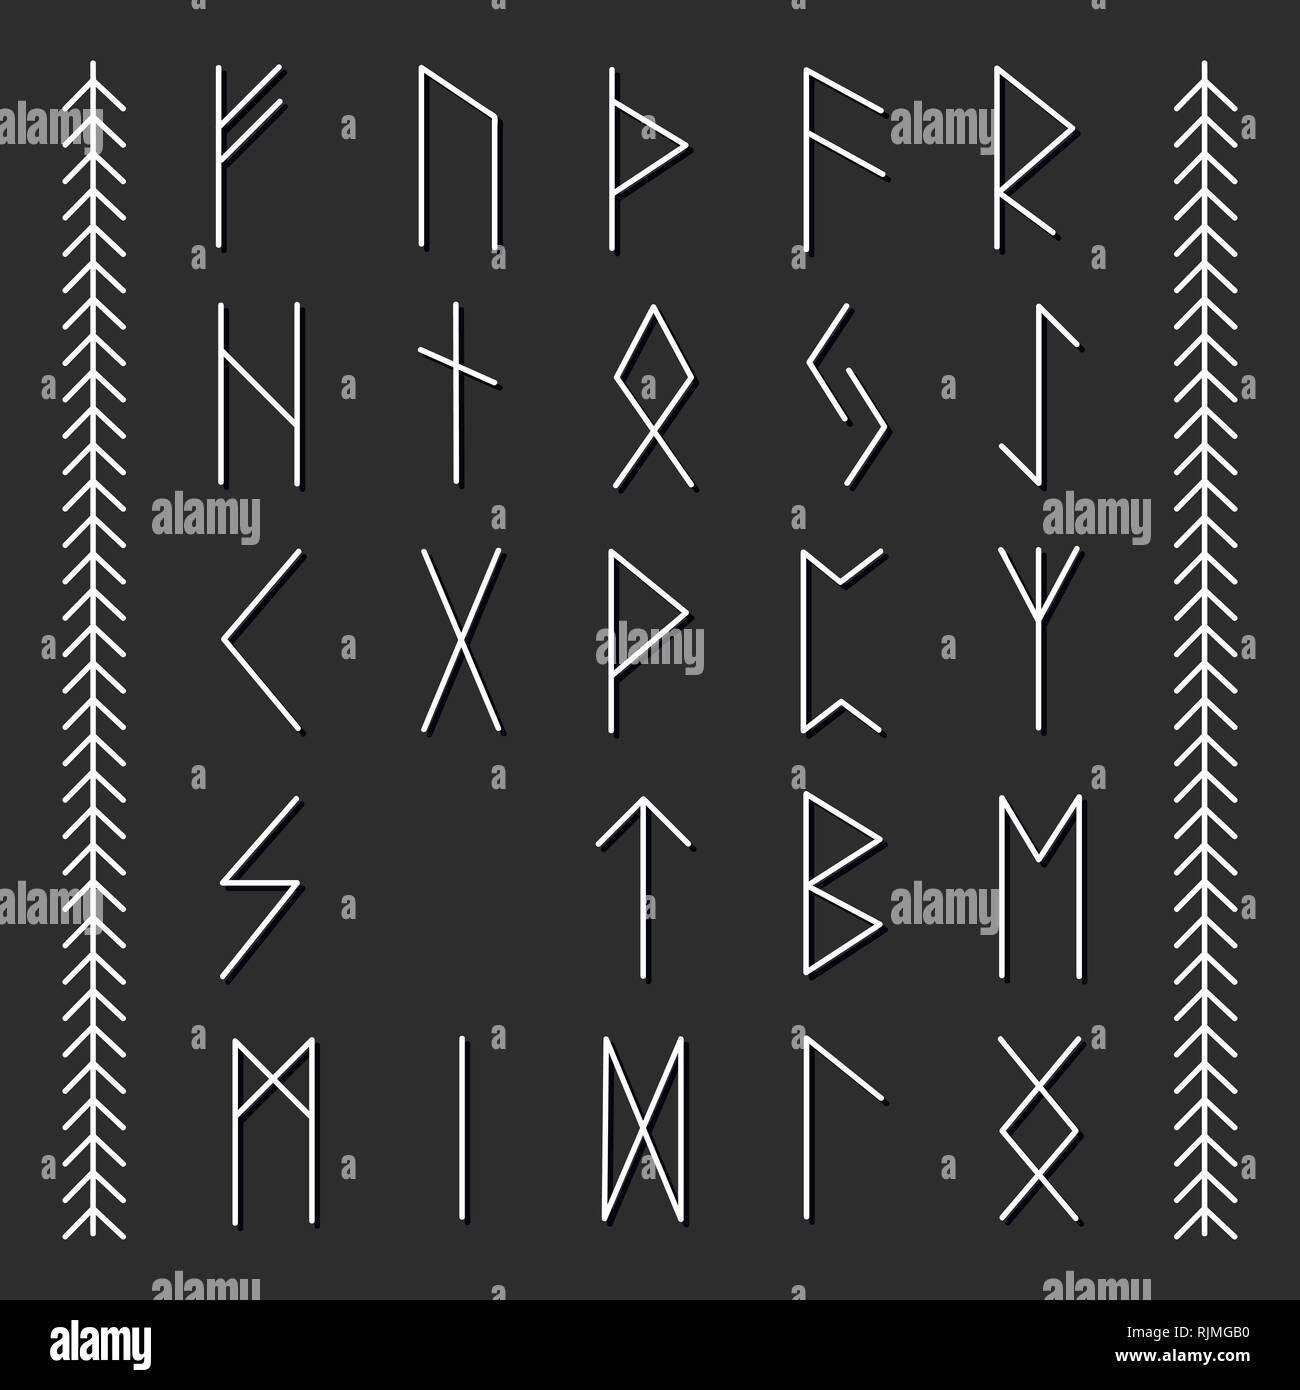 Set of Old Norse Scandinavian runes. Runic alphabet, futhark. - Stock Image